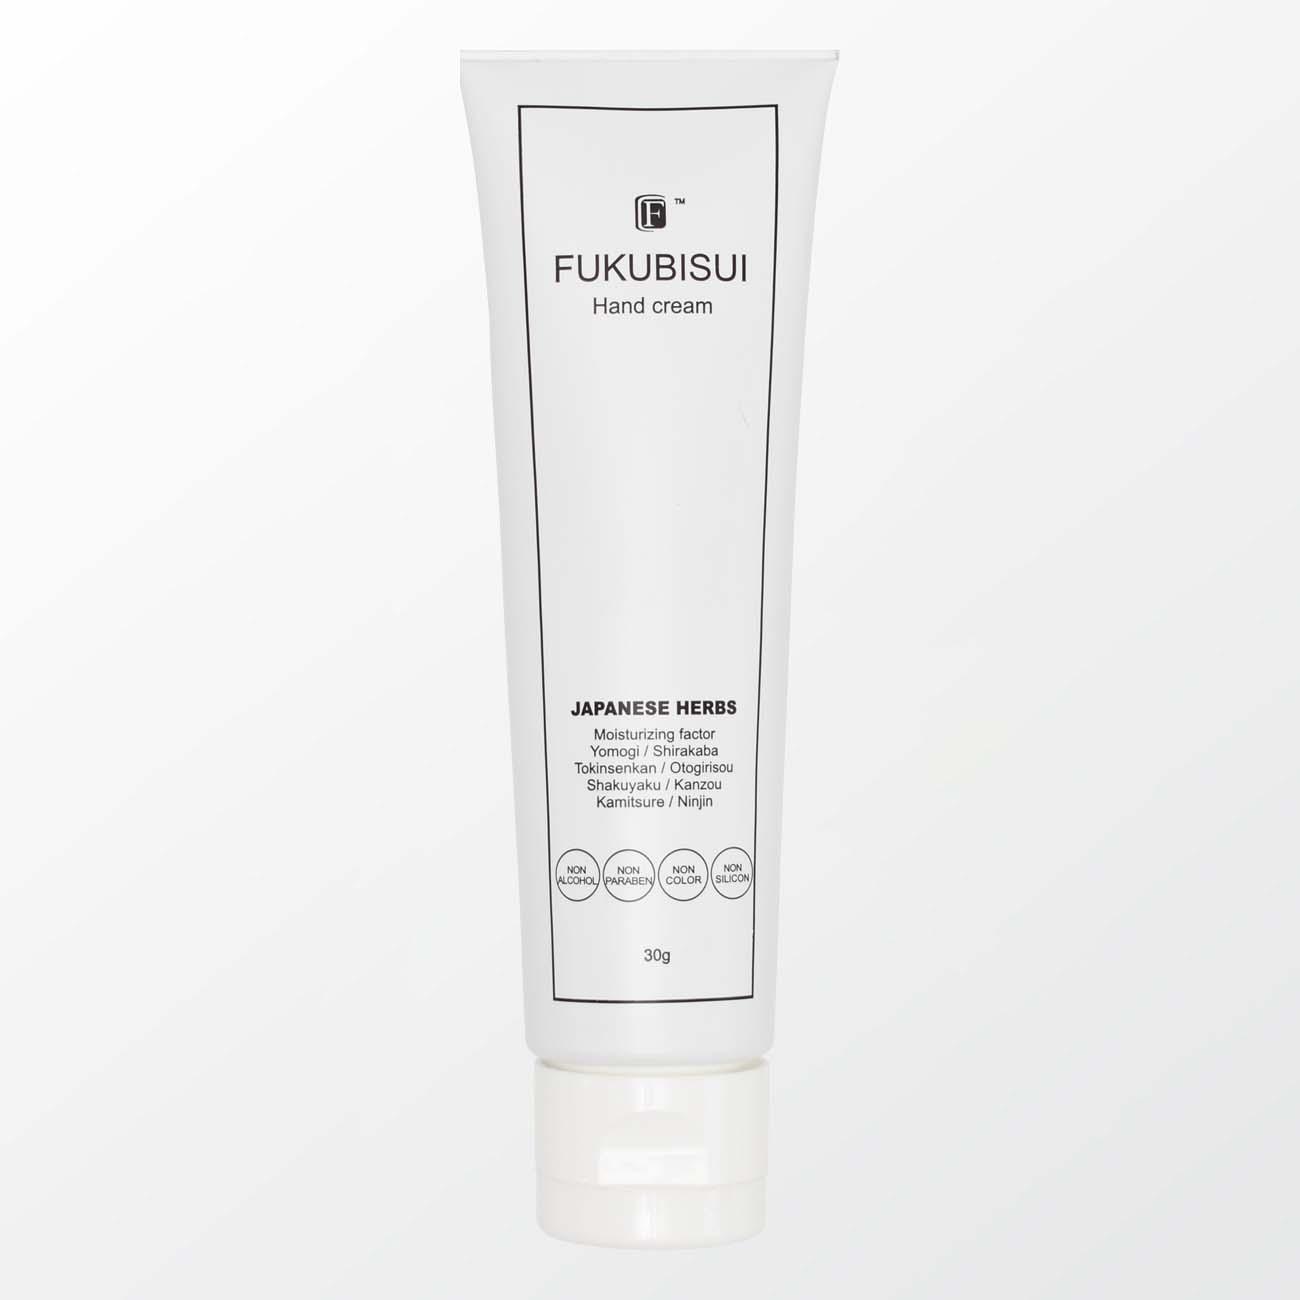 FUKUBISUI ハンドクリーム30g